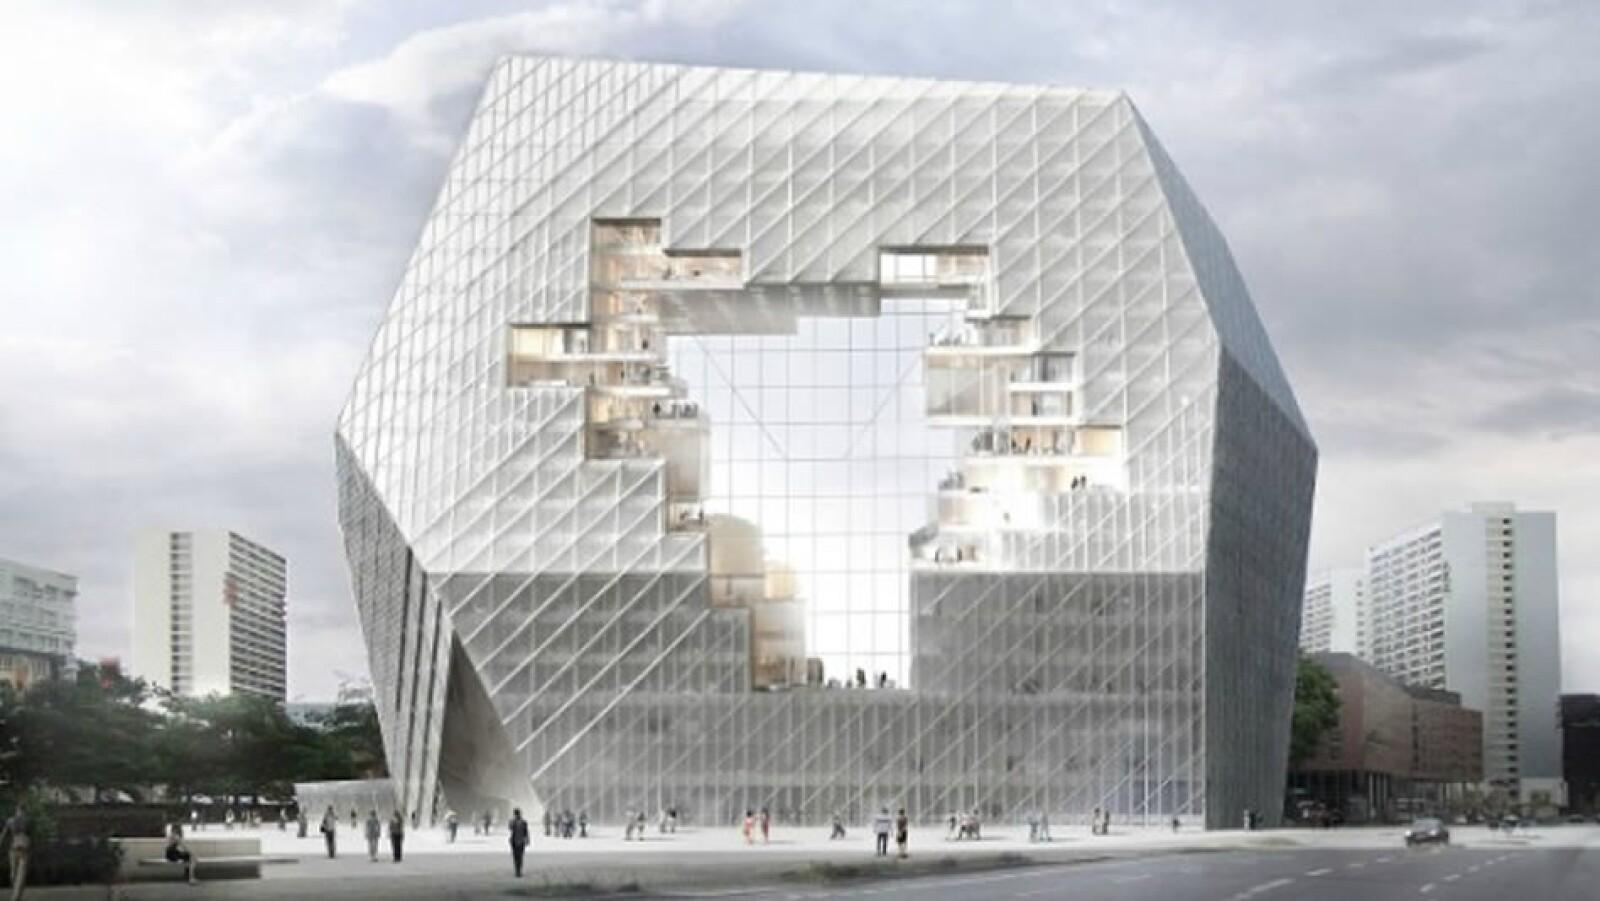 Oficinas de Axel Springer Berlin